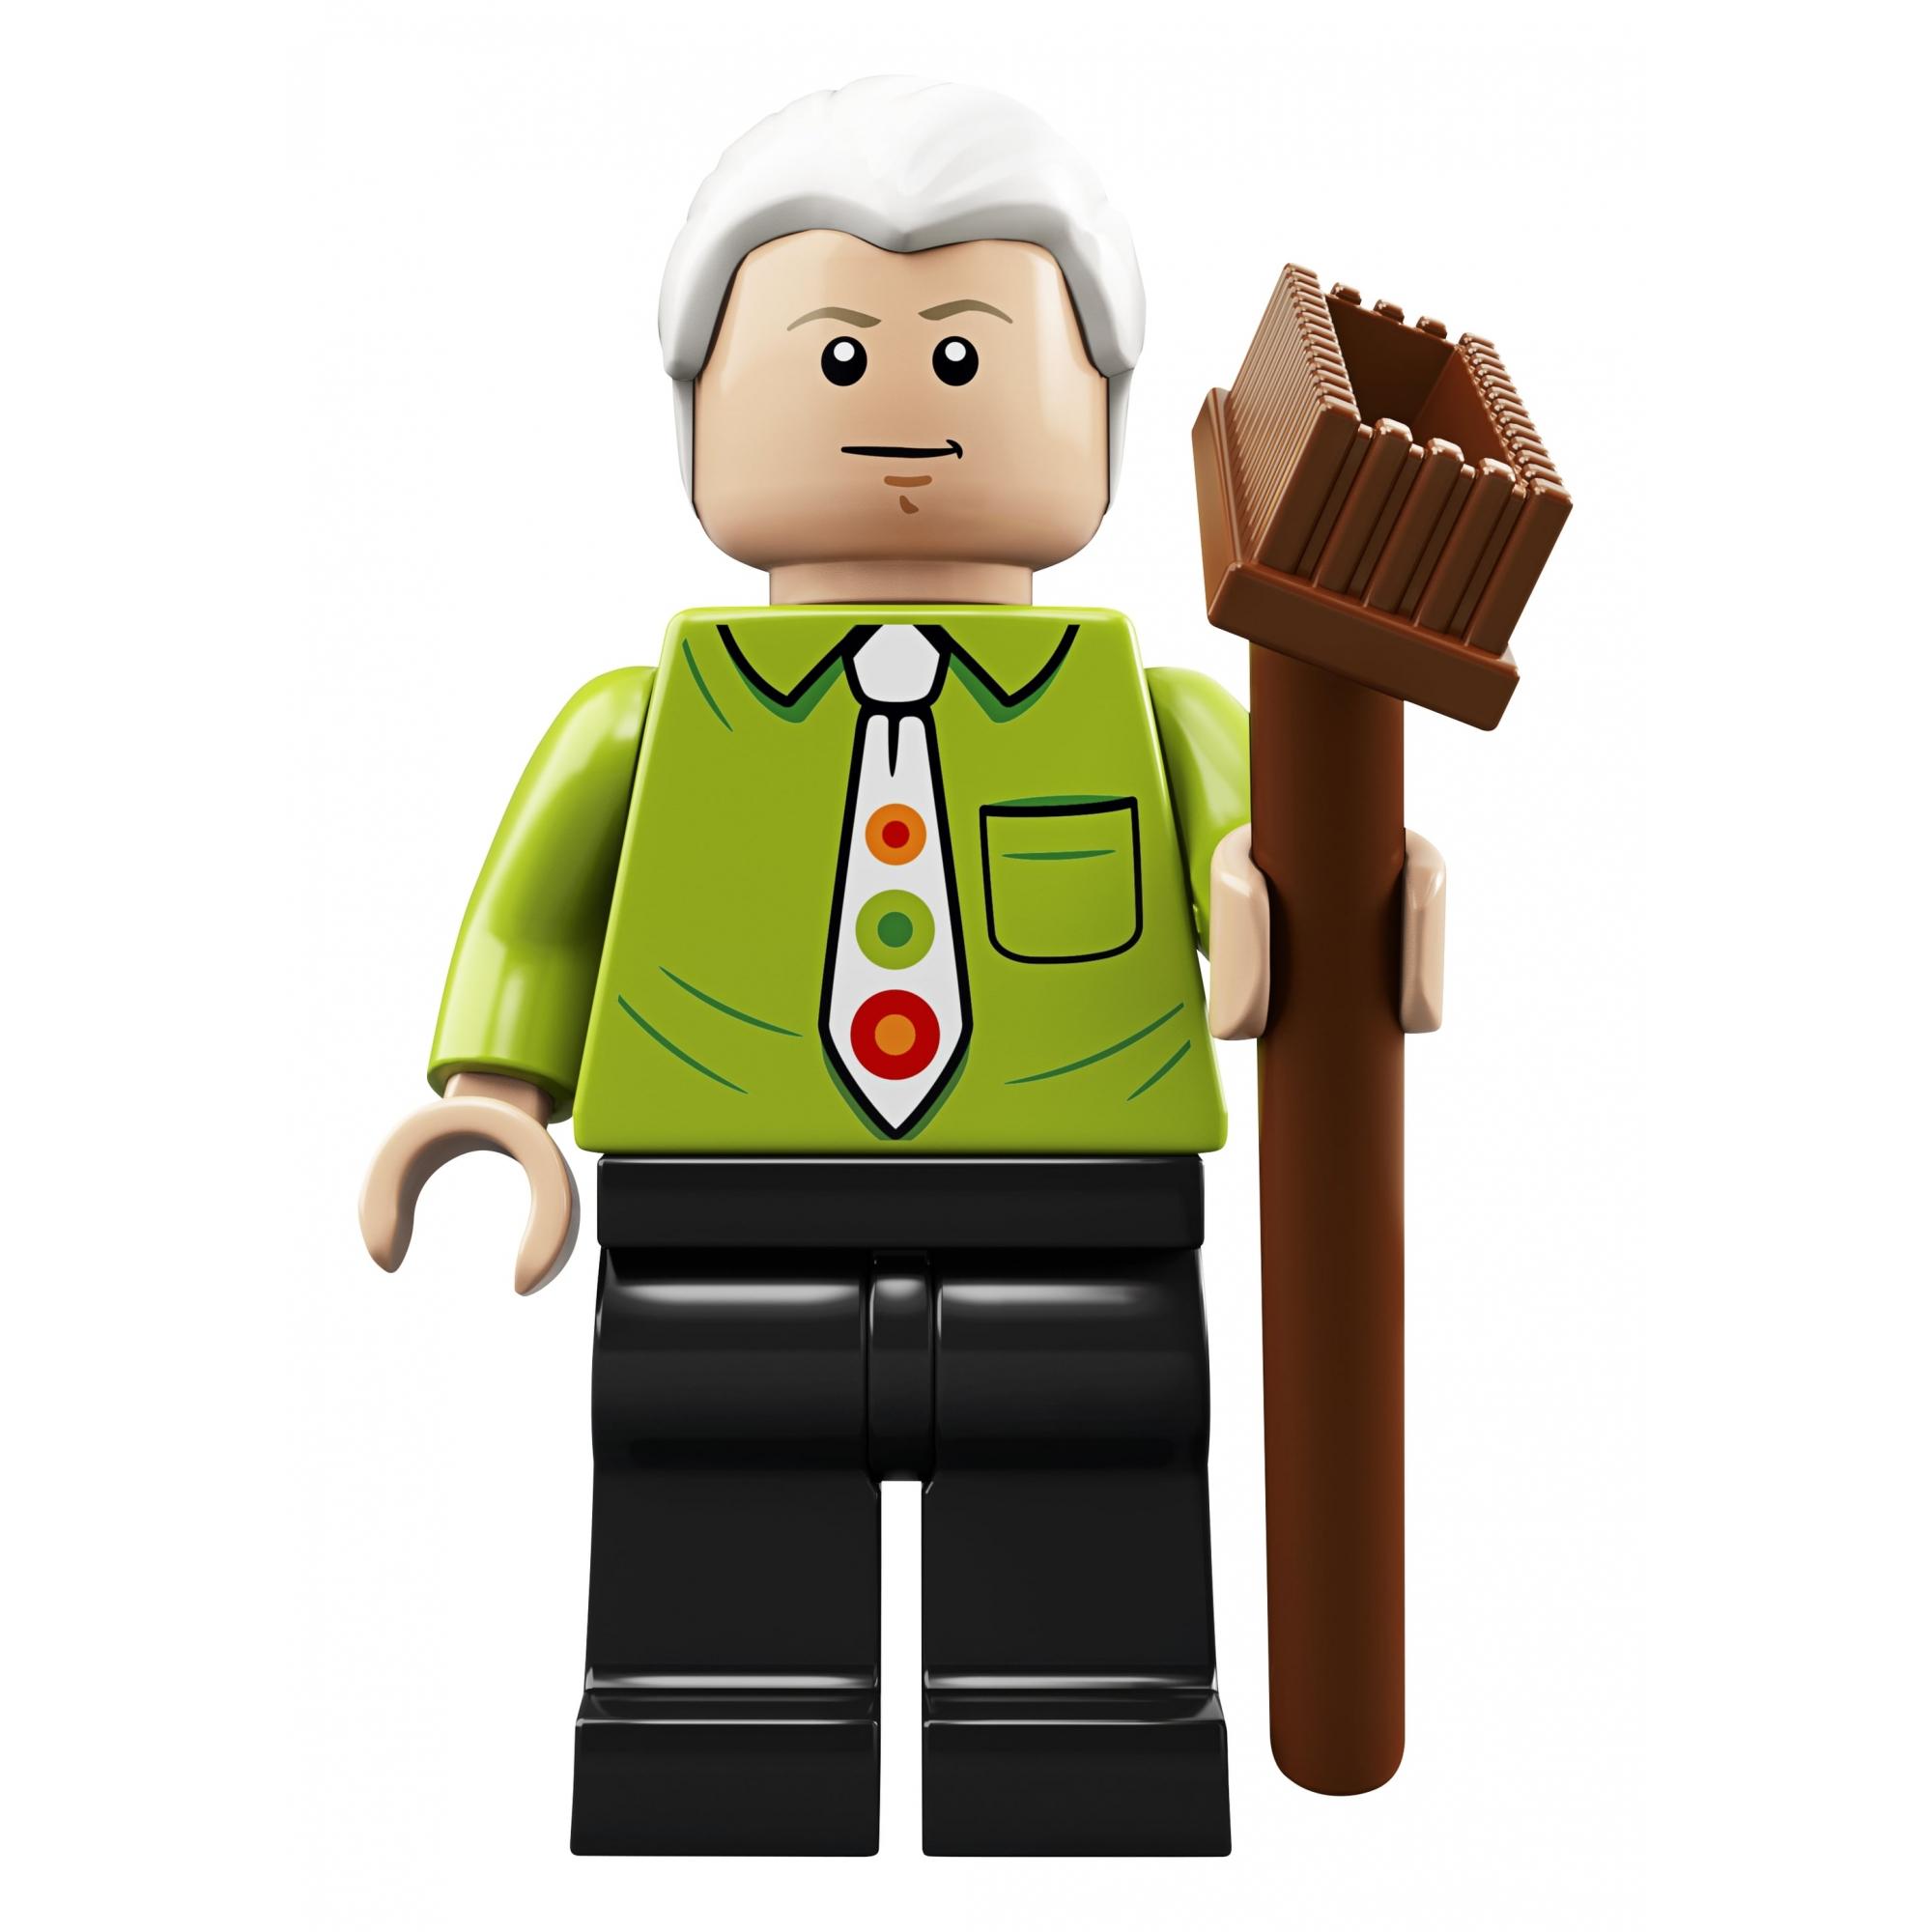 LEGO: Gunther - Friends